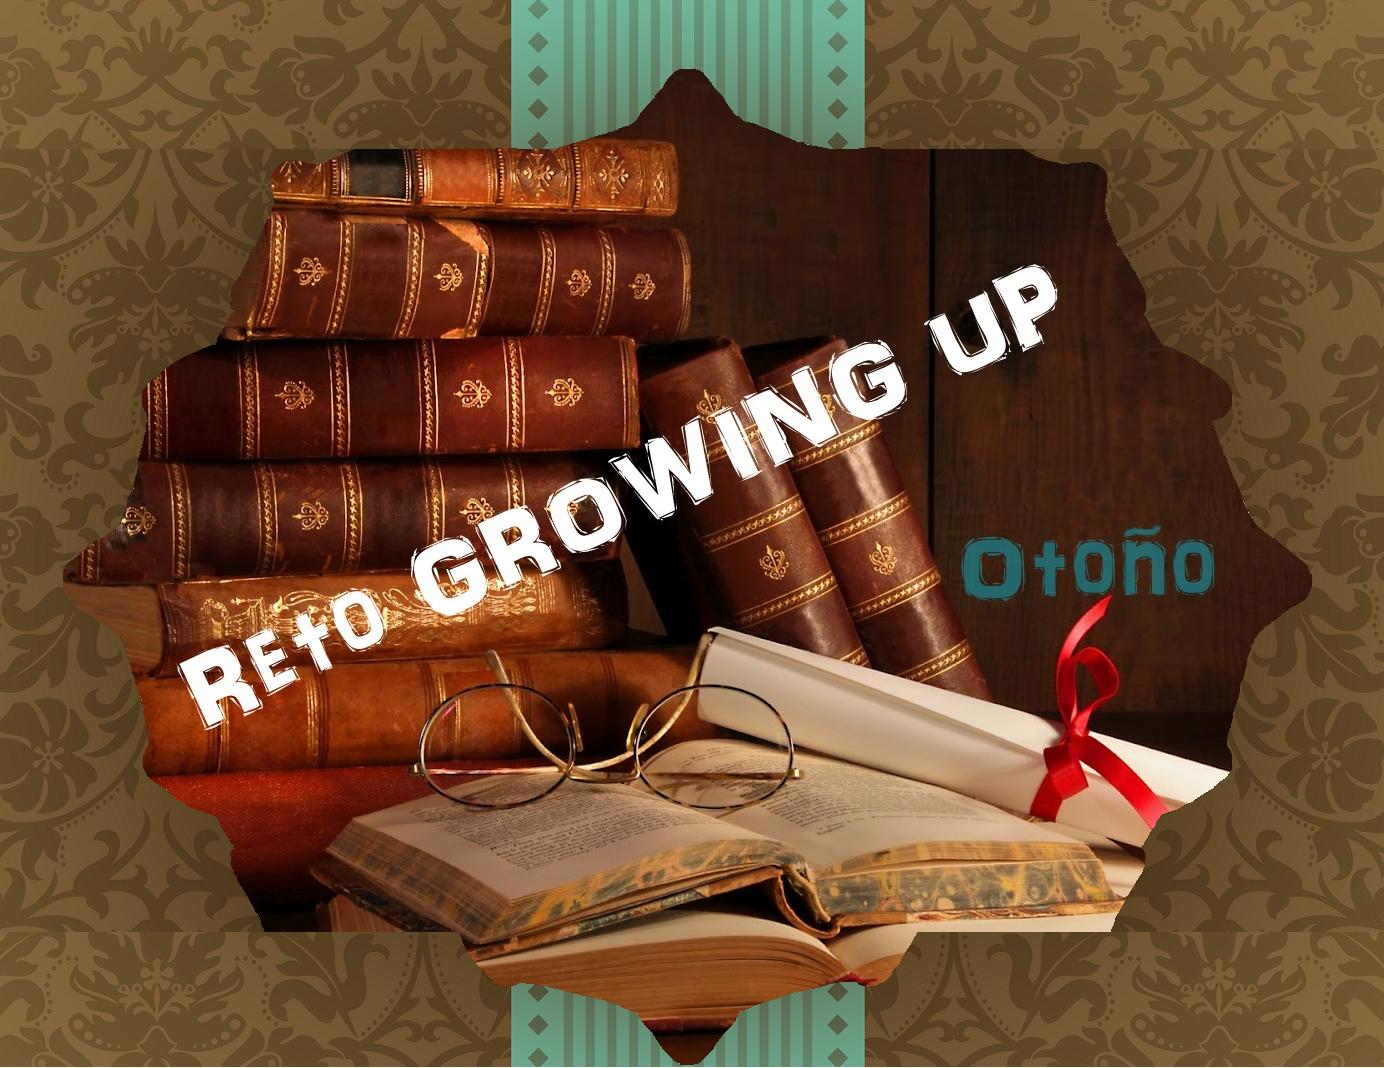 http://retazosdelibros.blogspot.com.ar/2014/03/reto-growing-up-otono-crecer-leyendo.html